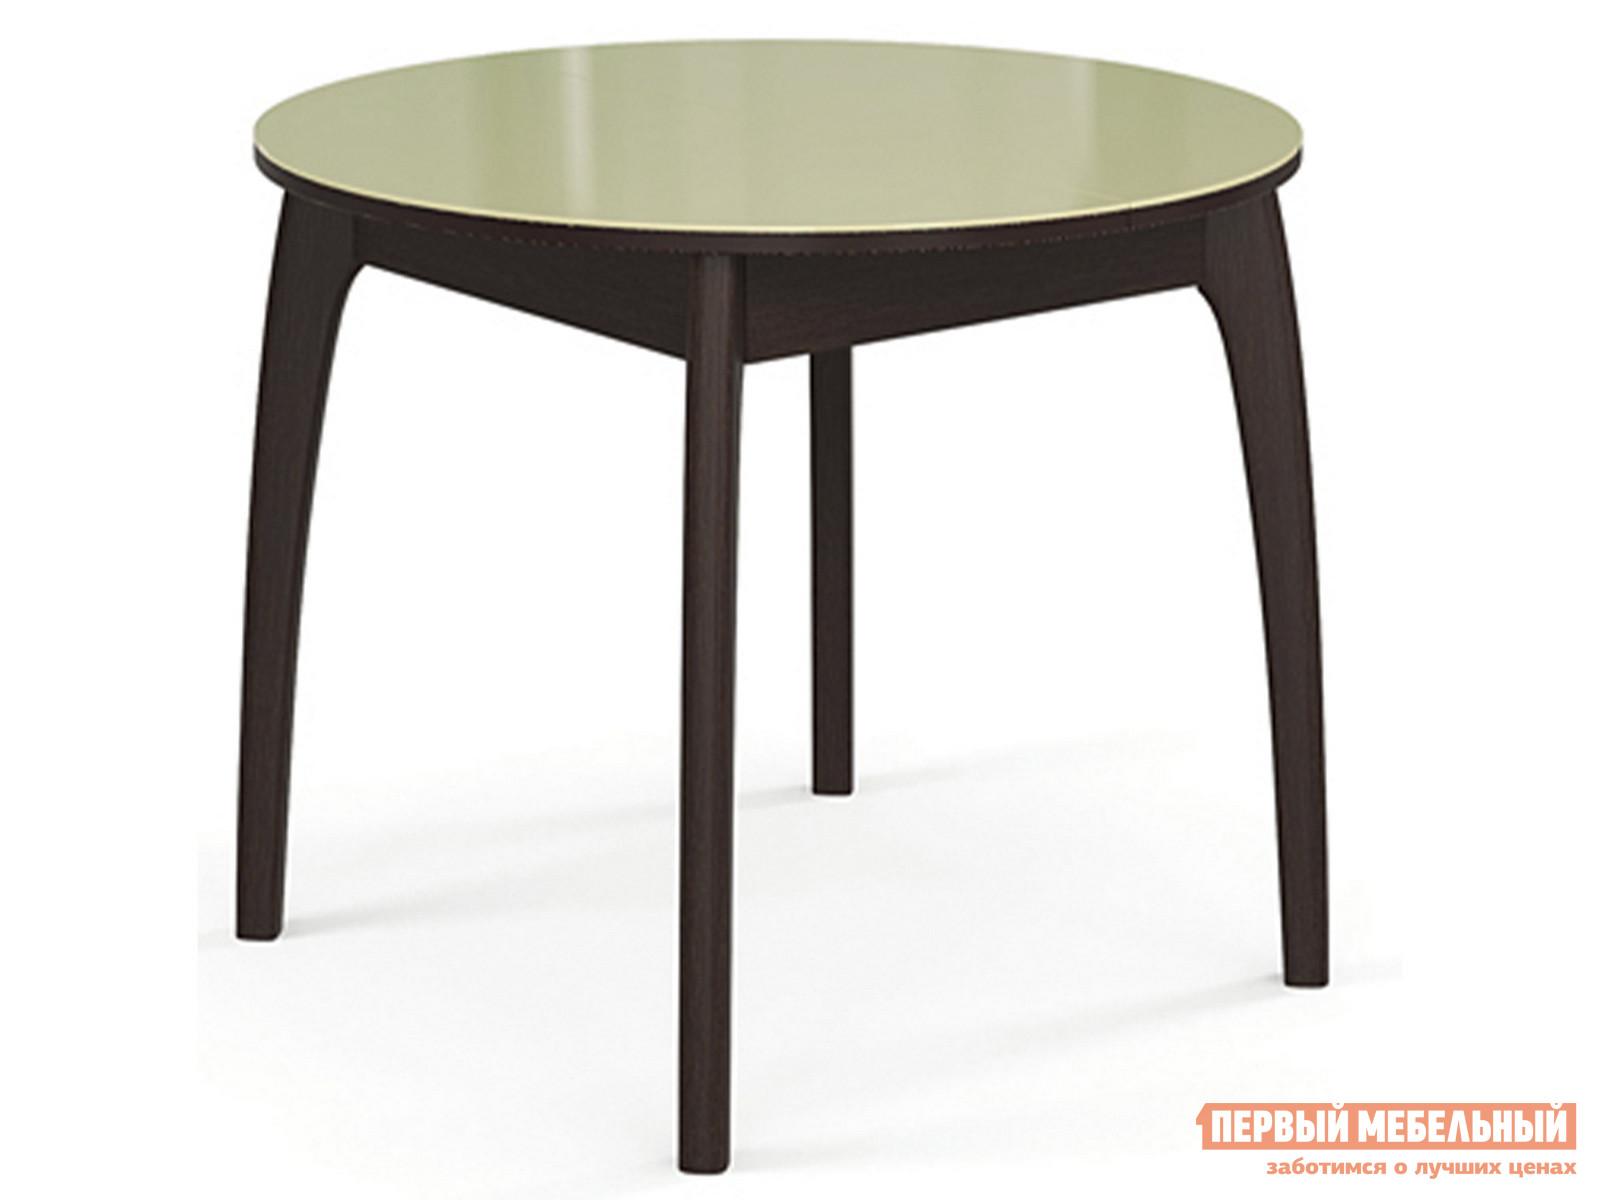 Кухонный стол  №46 ДН4 (круглый) Венге / Стекло бежевое ДИК 59602